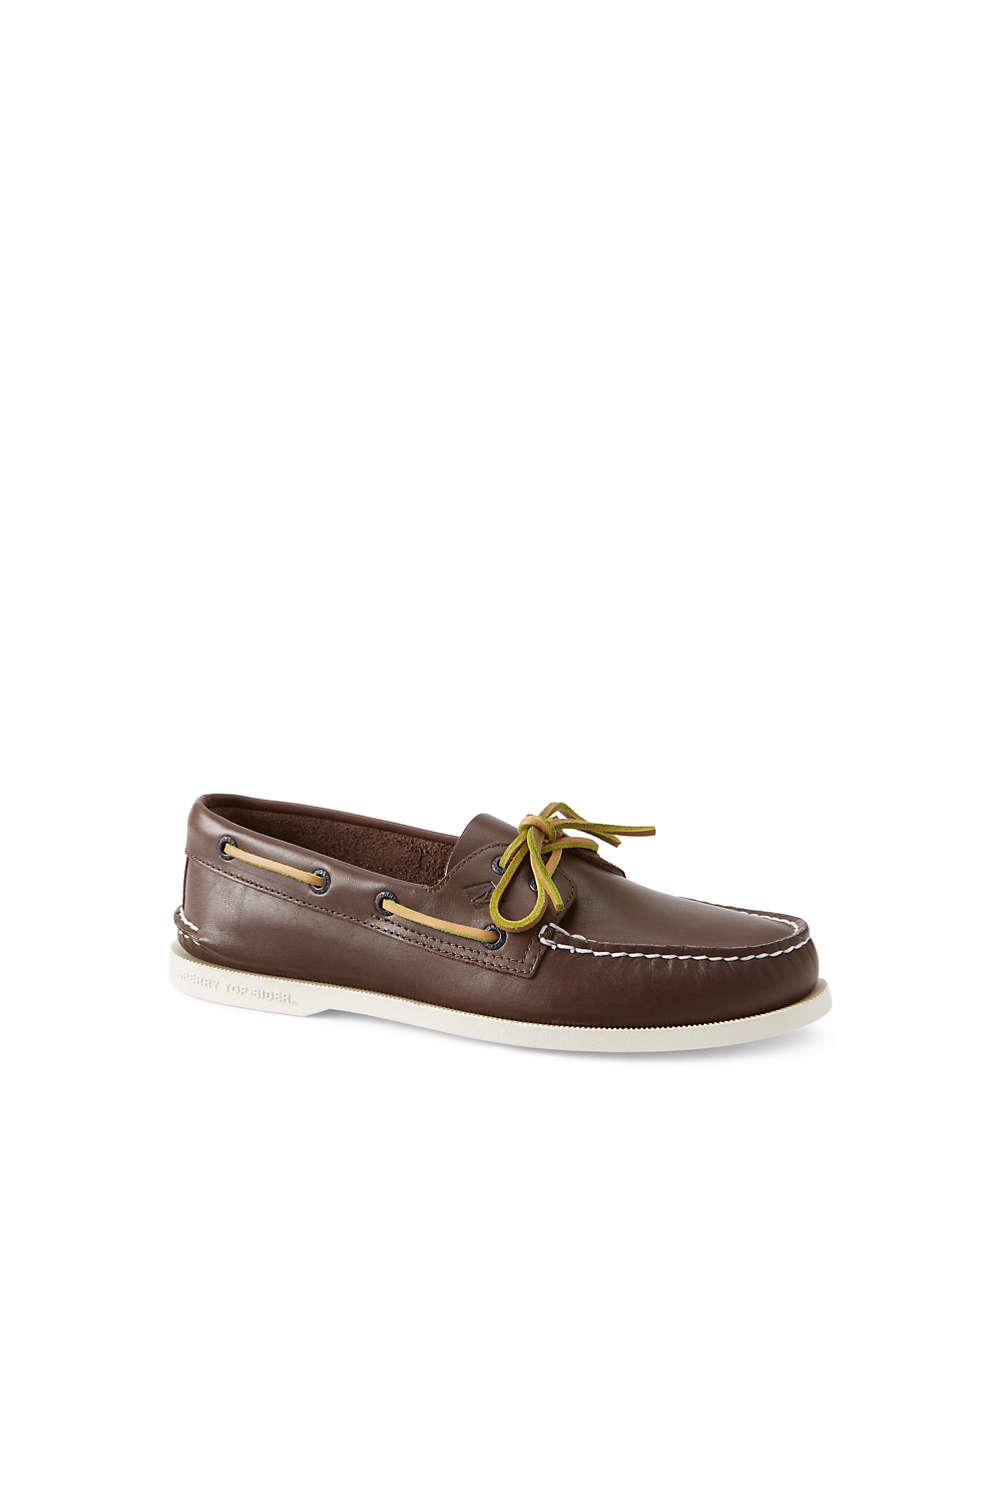 d922d974c6f School Uniform Men s Sperry Authentic Original 2 Eye Boat Shoes from ...